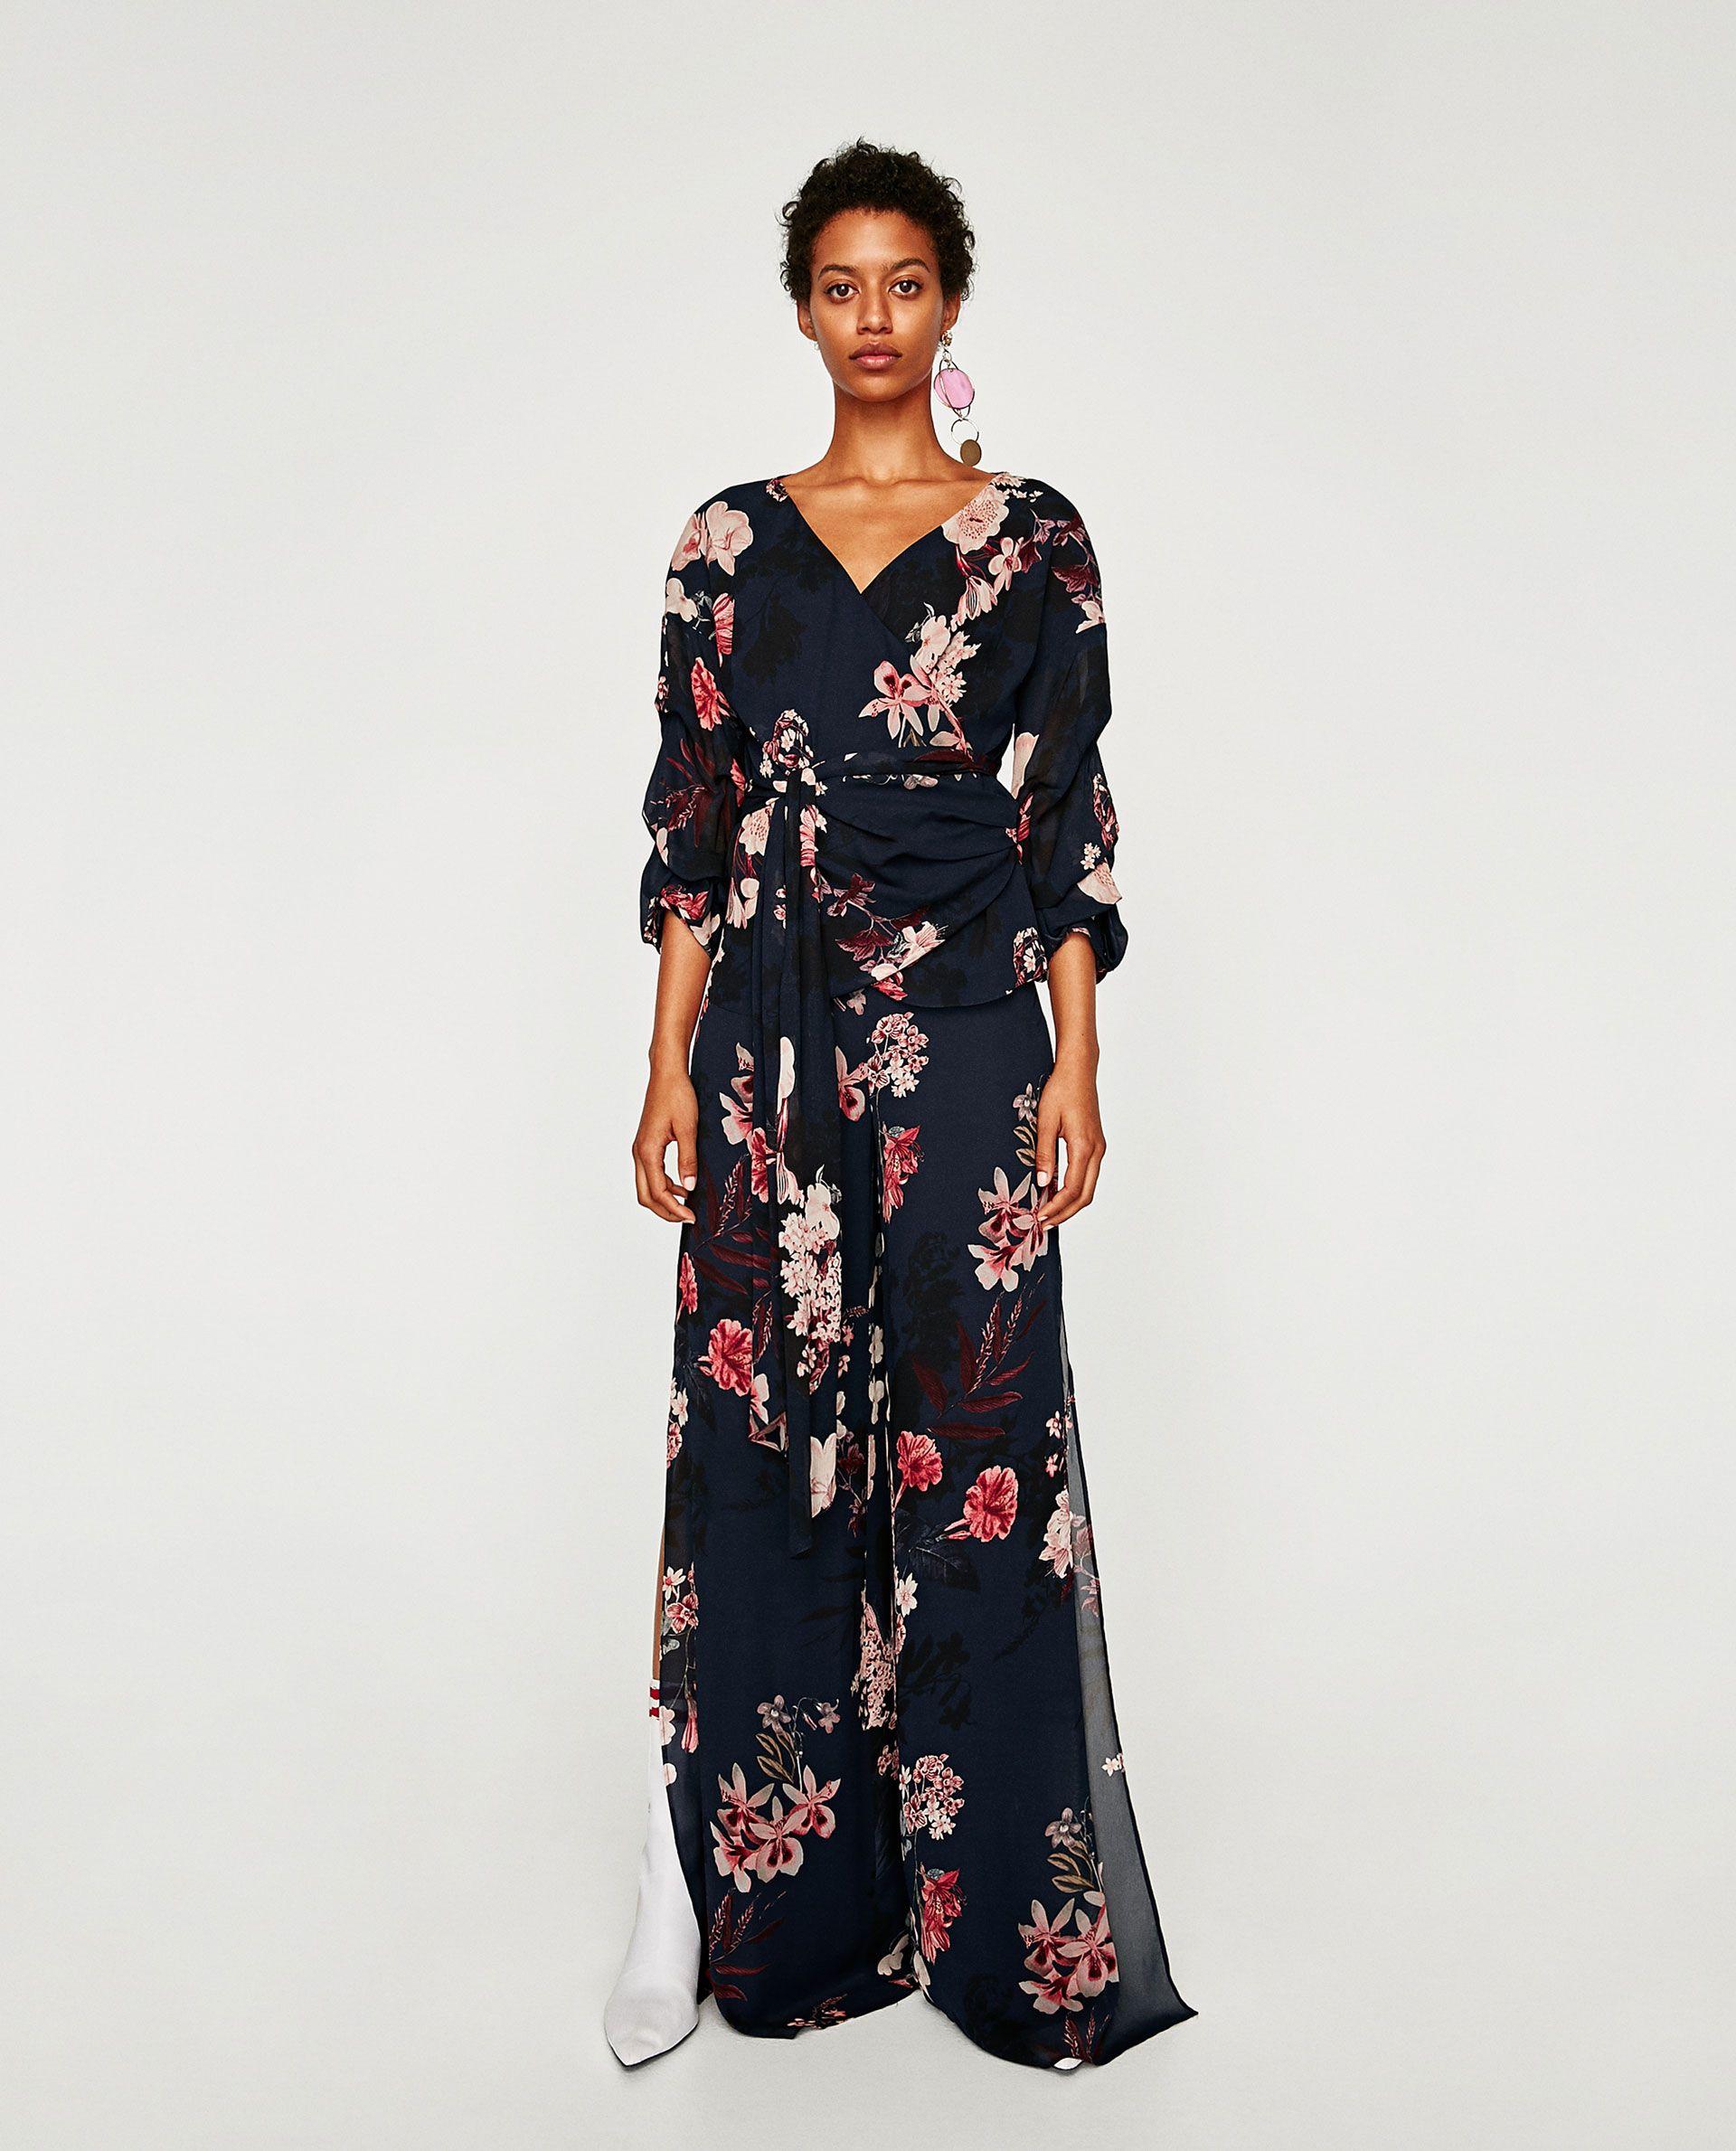 2e5d99469f6 BLUSA CRUZADA ESTAMPADO FLORAL | | style | Printed trousers, Wrap ...